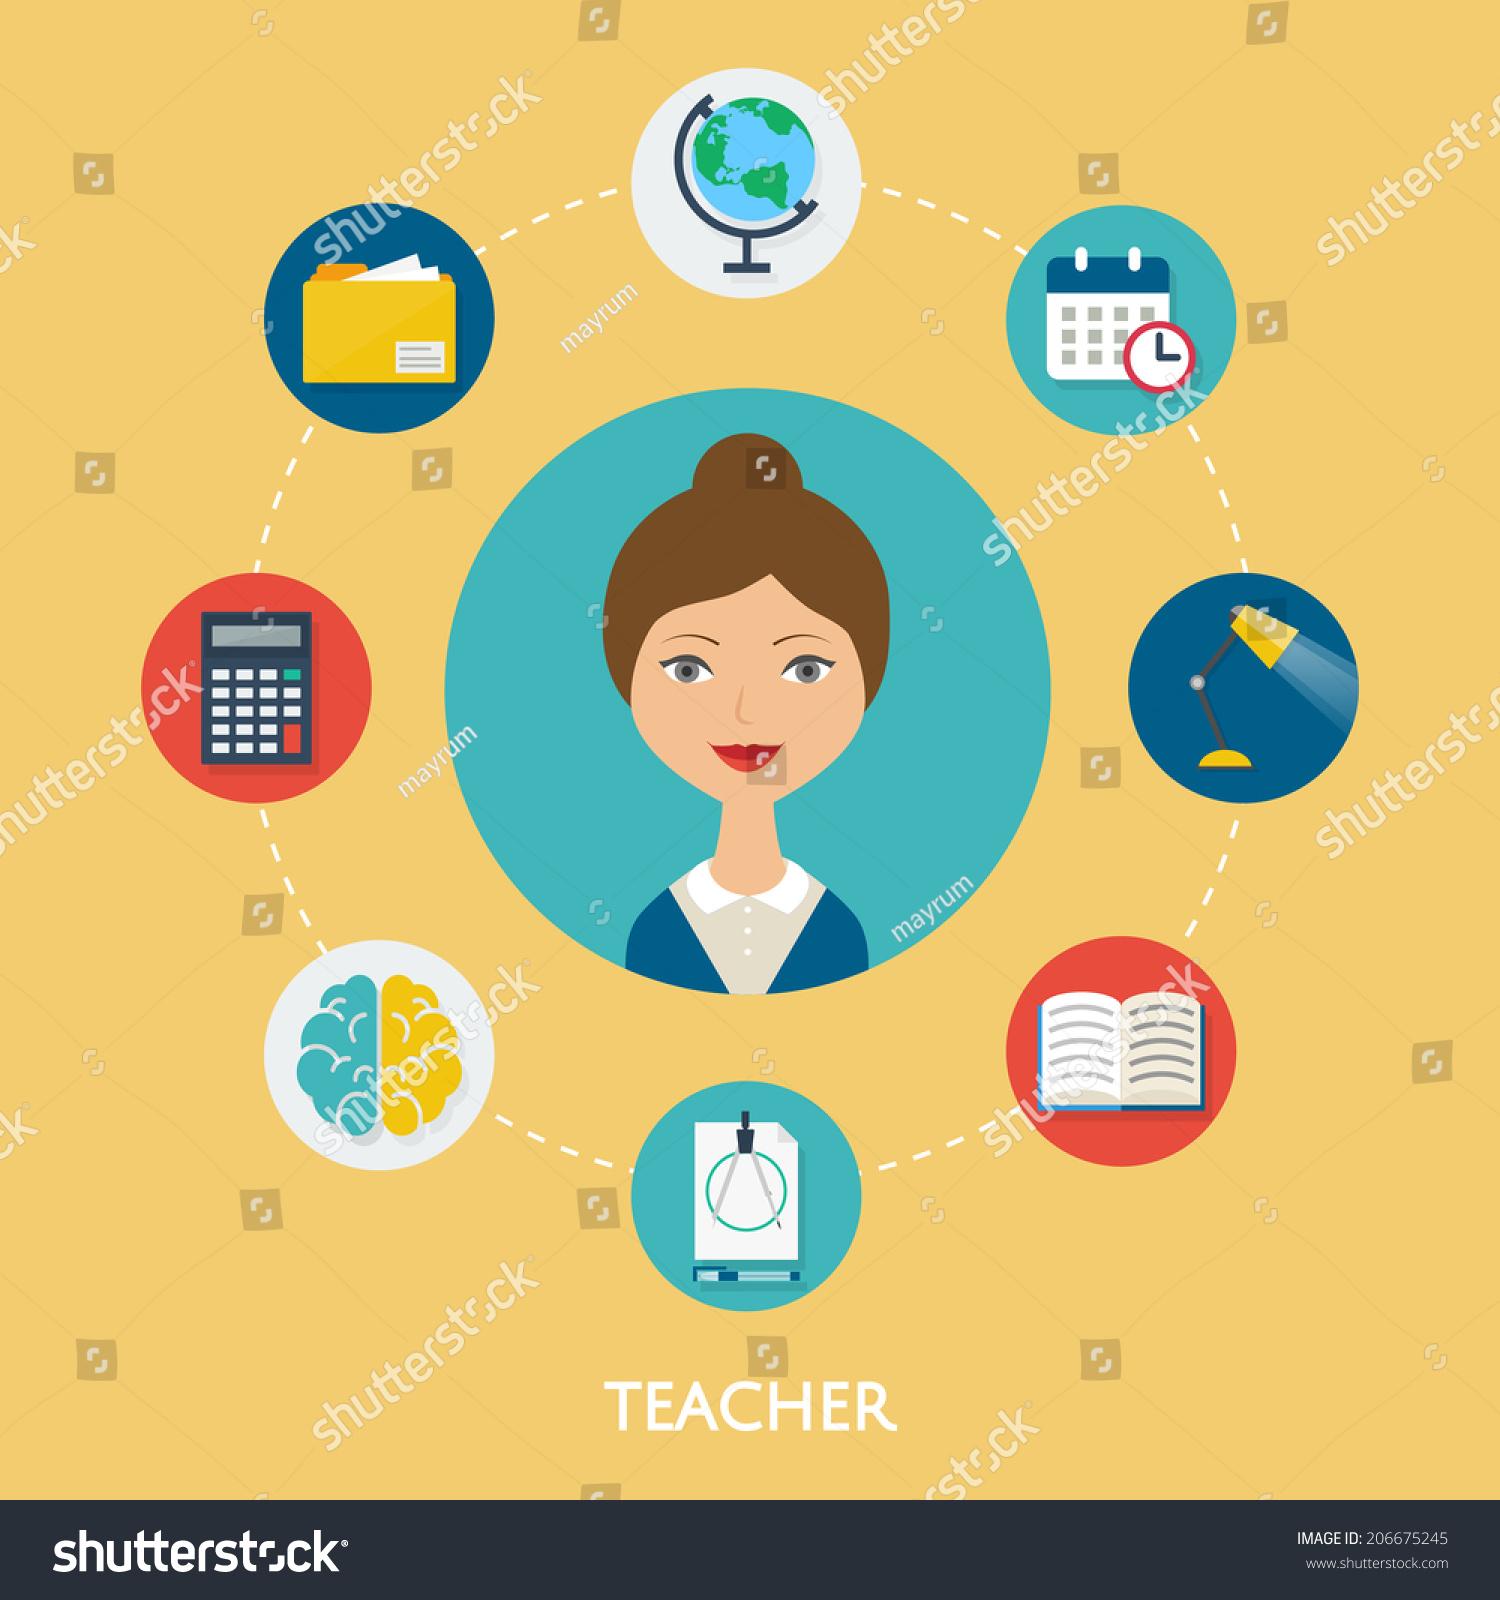 Teacher Character Illustration Icons Vector Flat Stock Vector ...